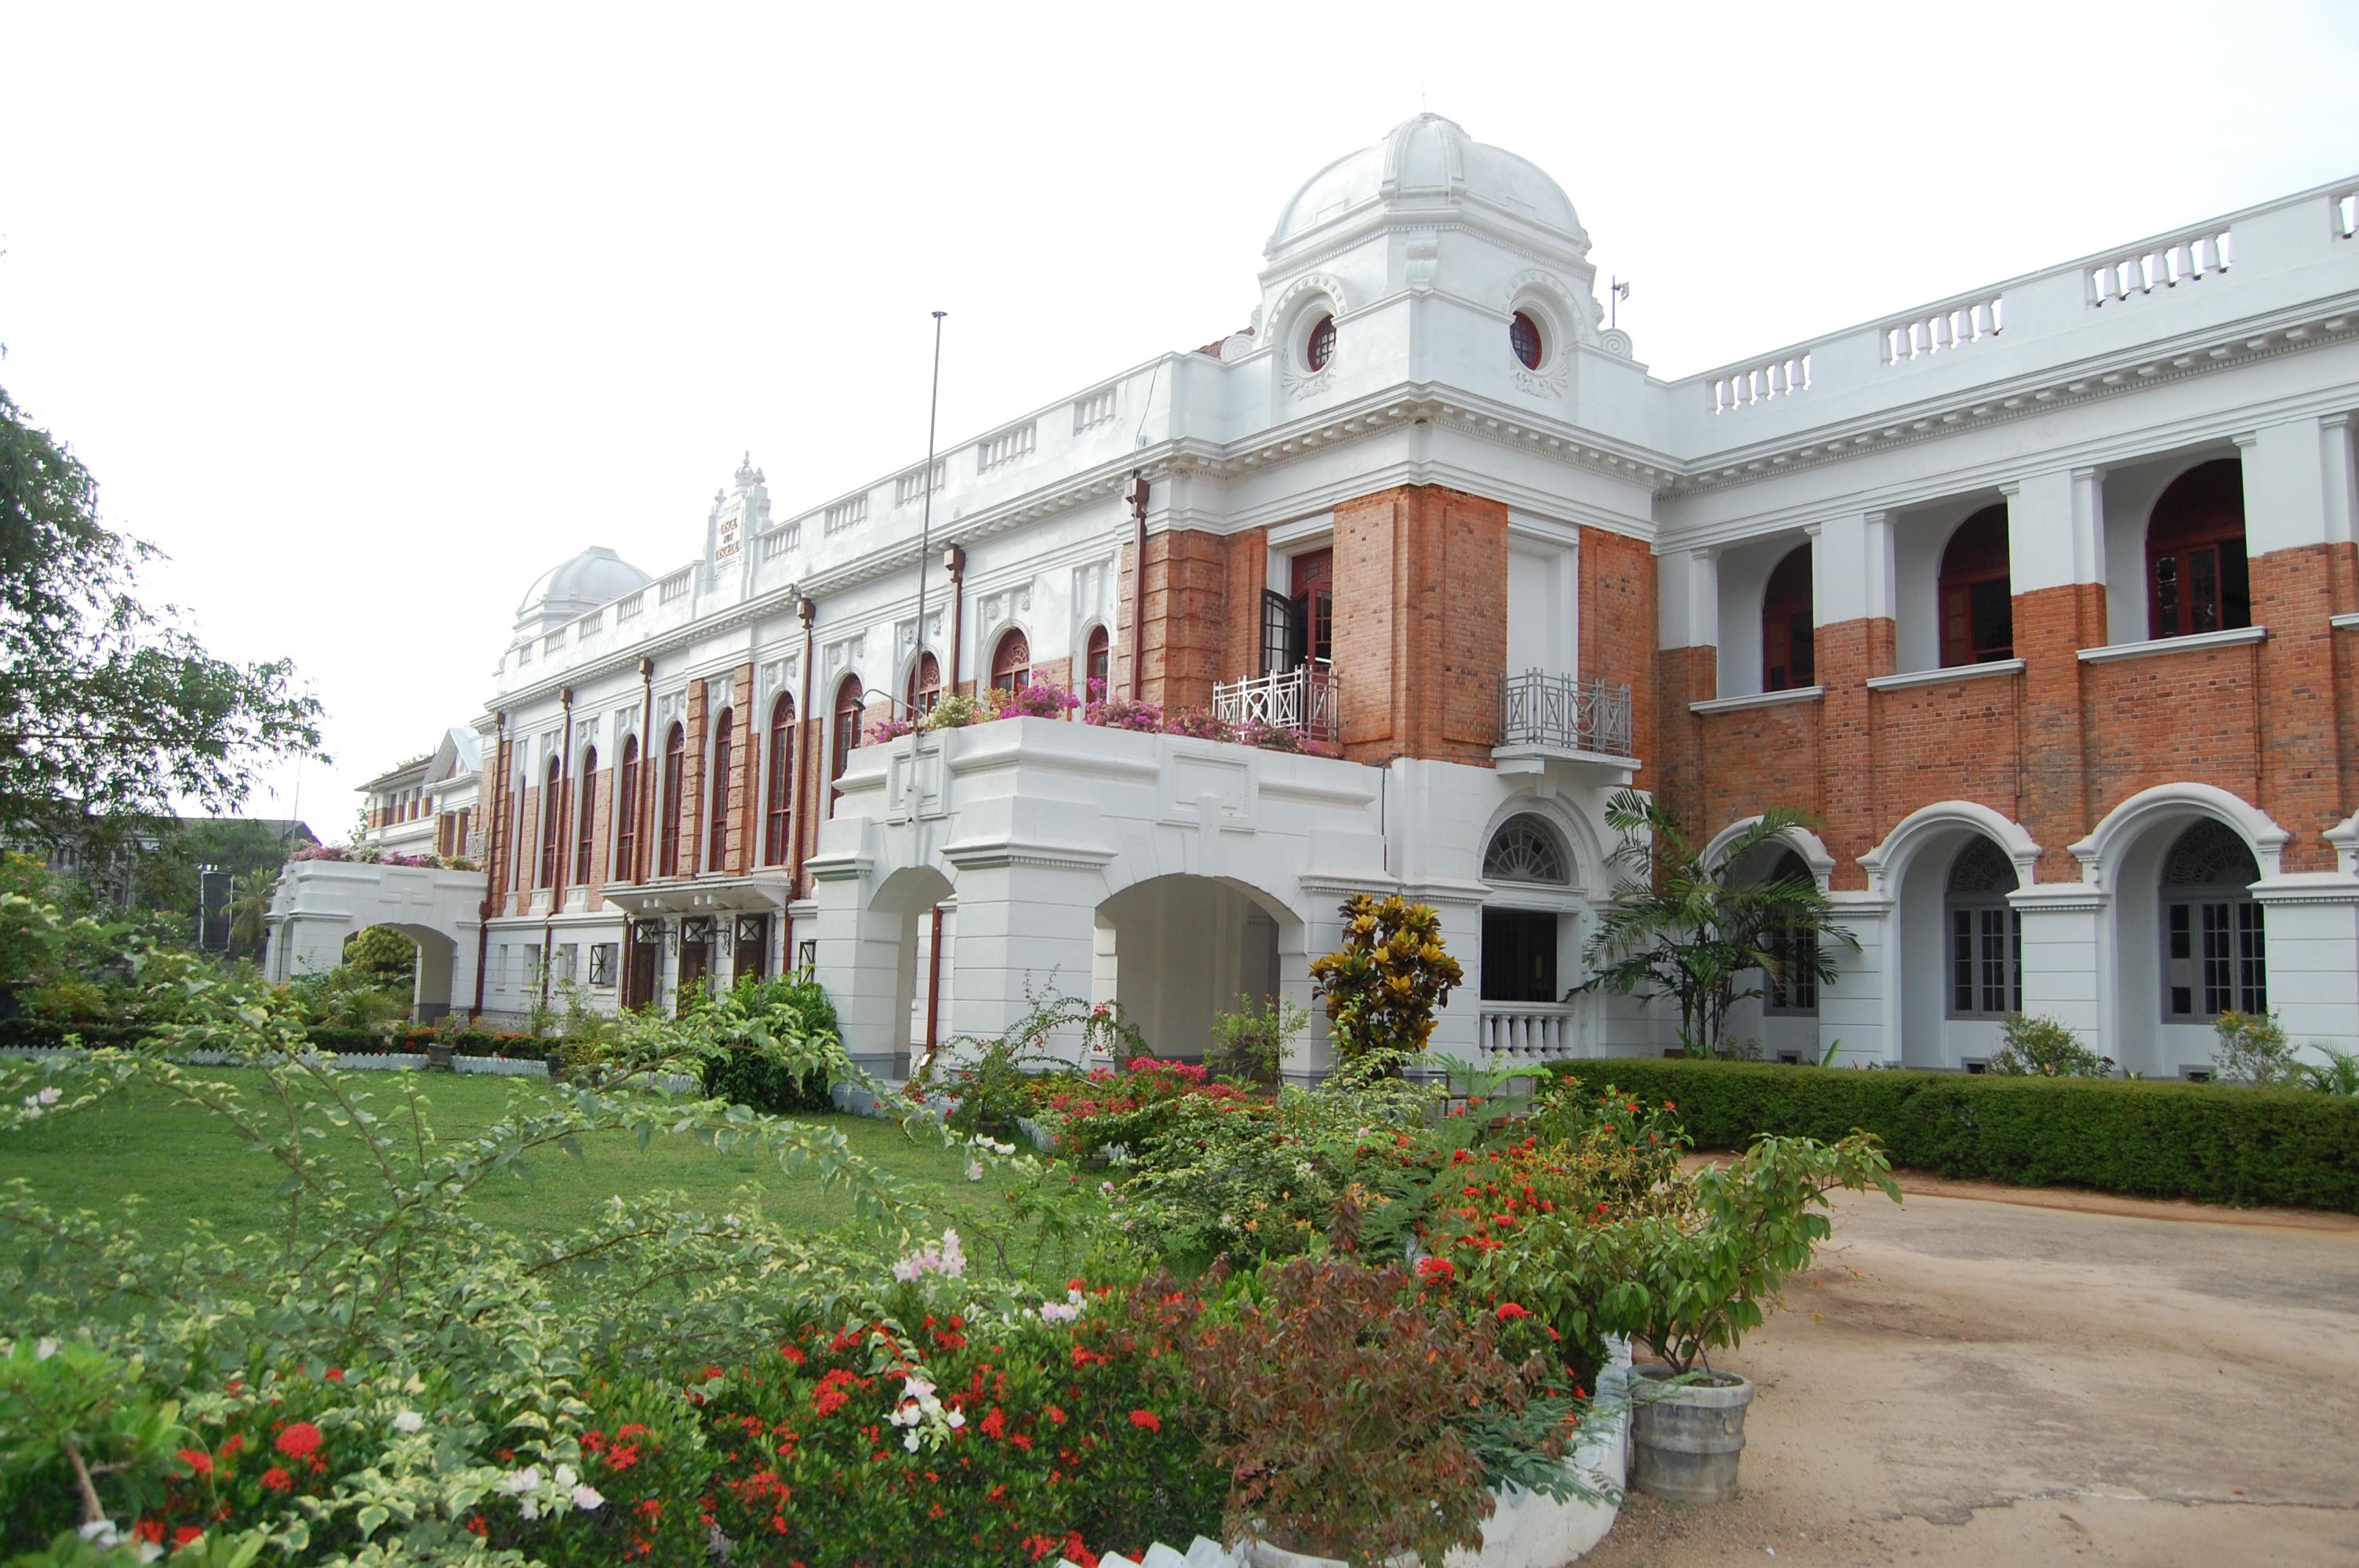 royal college Royal college is inexpensive cbse boarding school dehradun india, residential schools for boys & girls, school with hostel facility in dehradun.